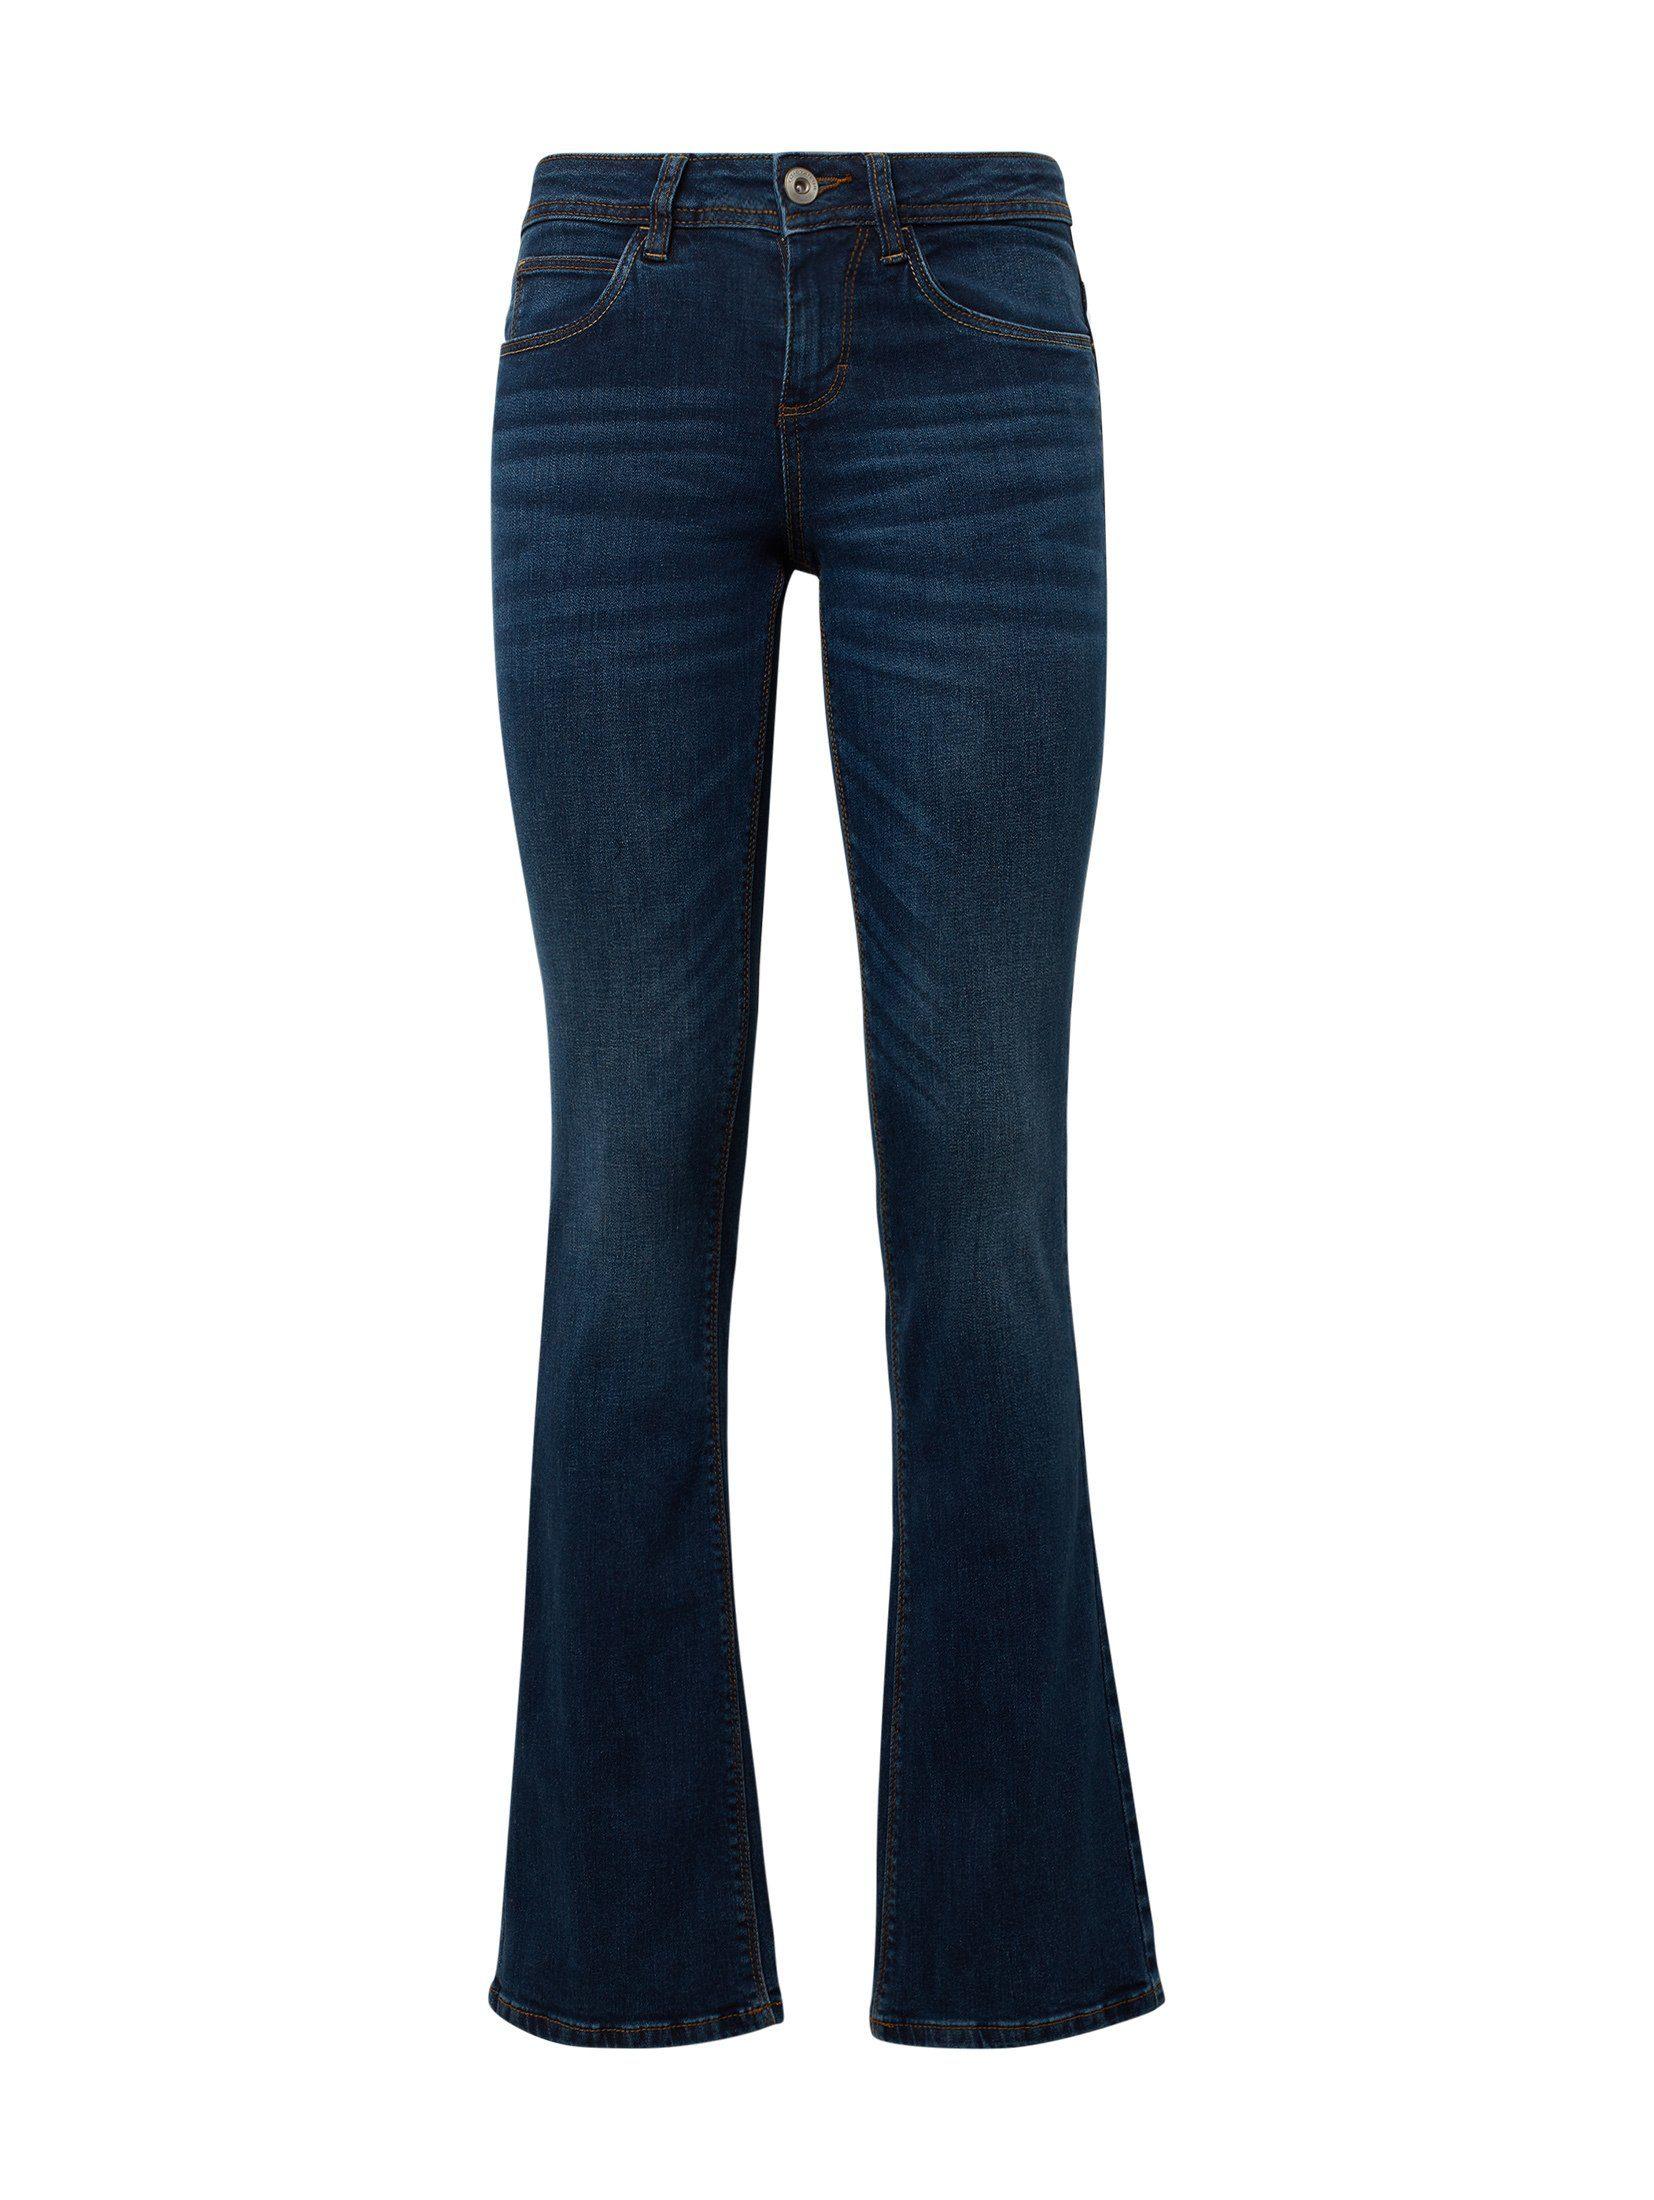 »alexa Bootcut Tom Bootcut« Narrow jeans Tailor vw0N8nm